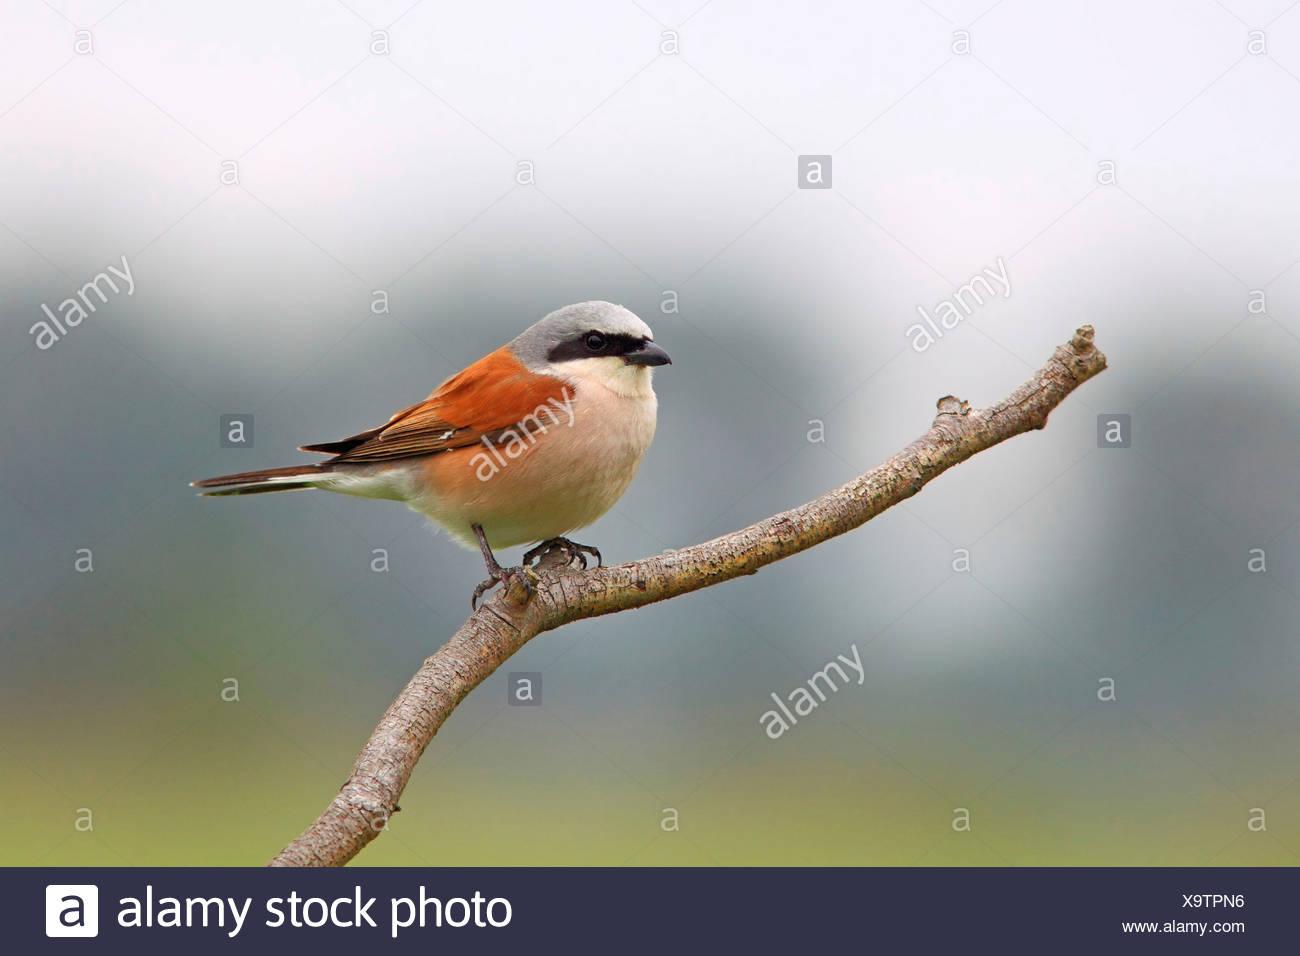 Red-backed Shrike (Lanius collurio), male, perched on branch, Illmitz, Burgenland, Austria Stock Photo